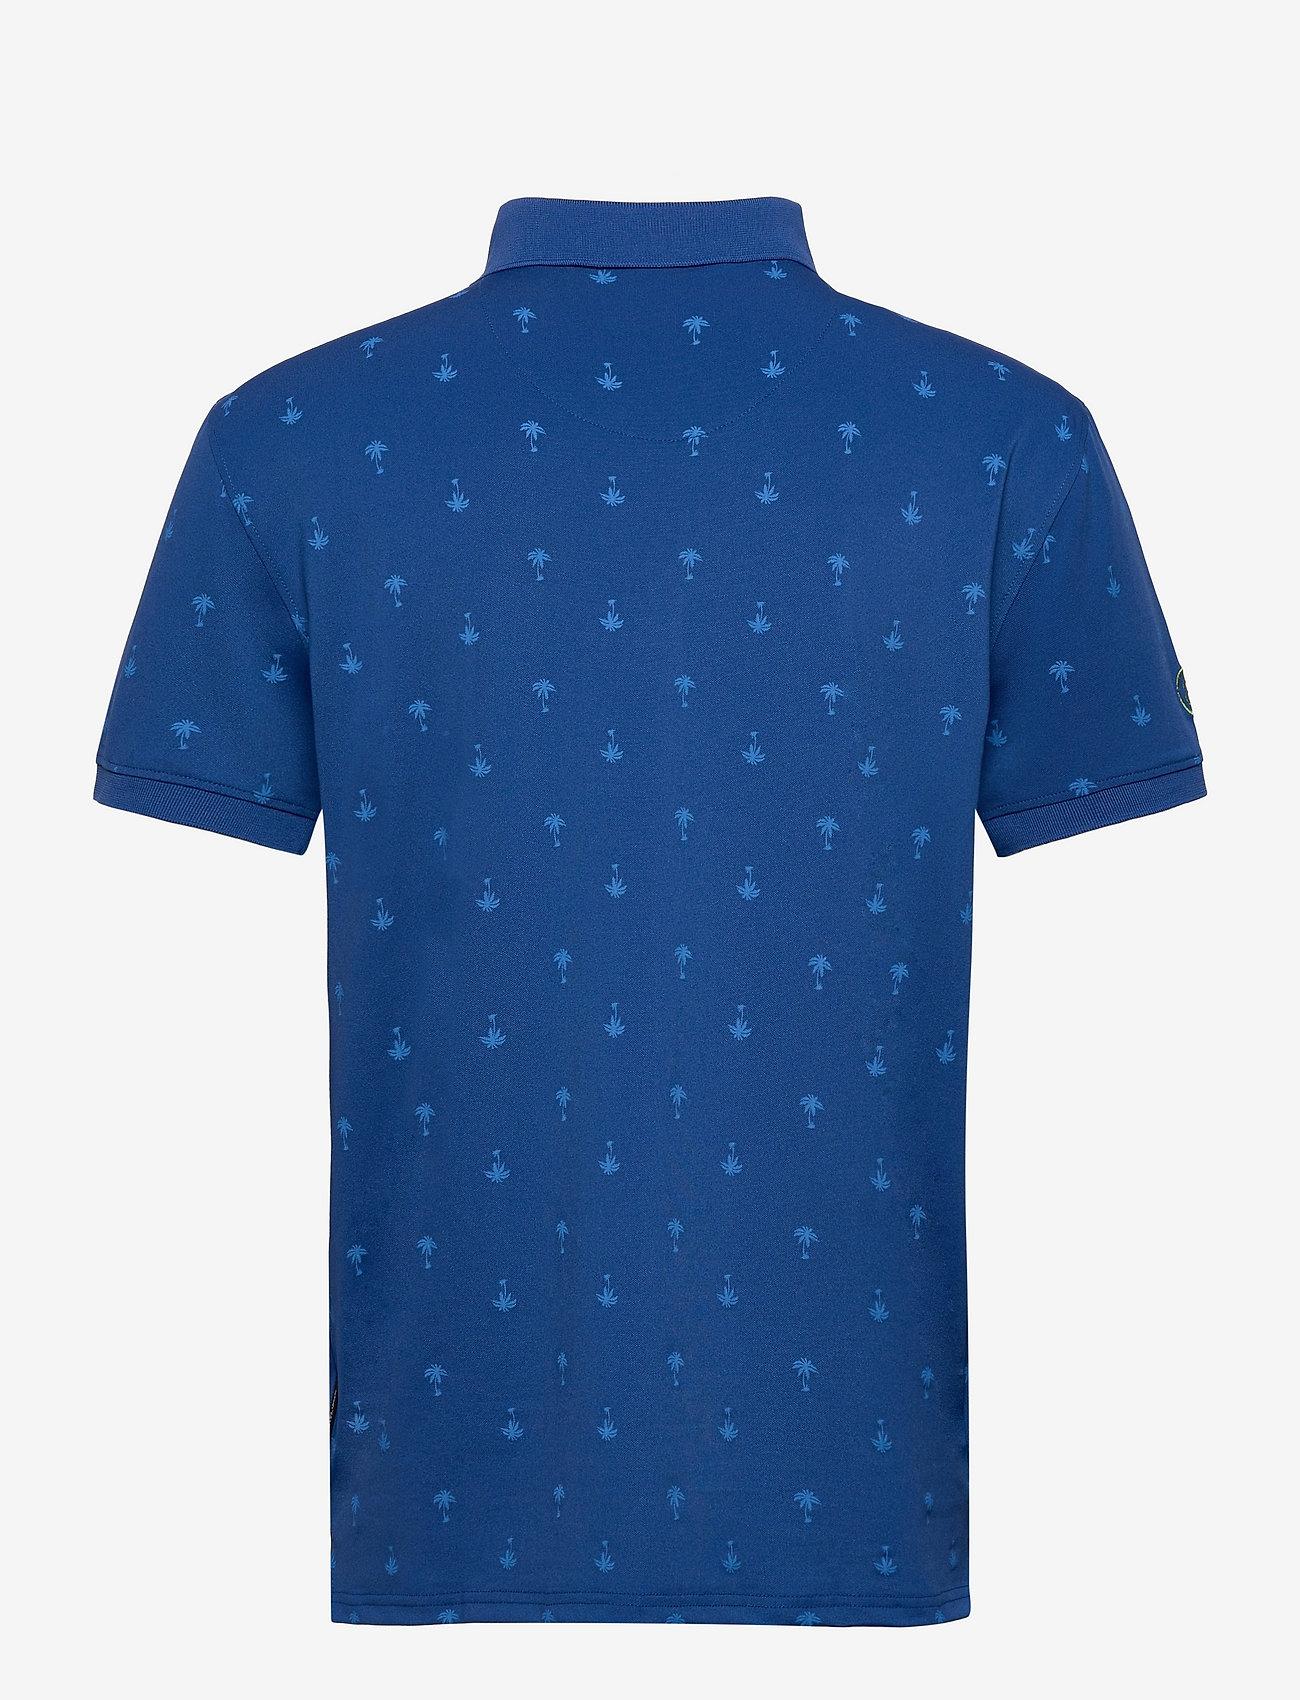 Abacus - Hankley polo - polo's - atlantic blue - 1